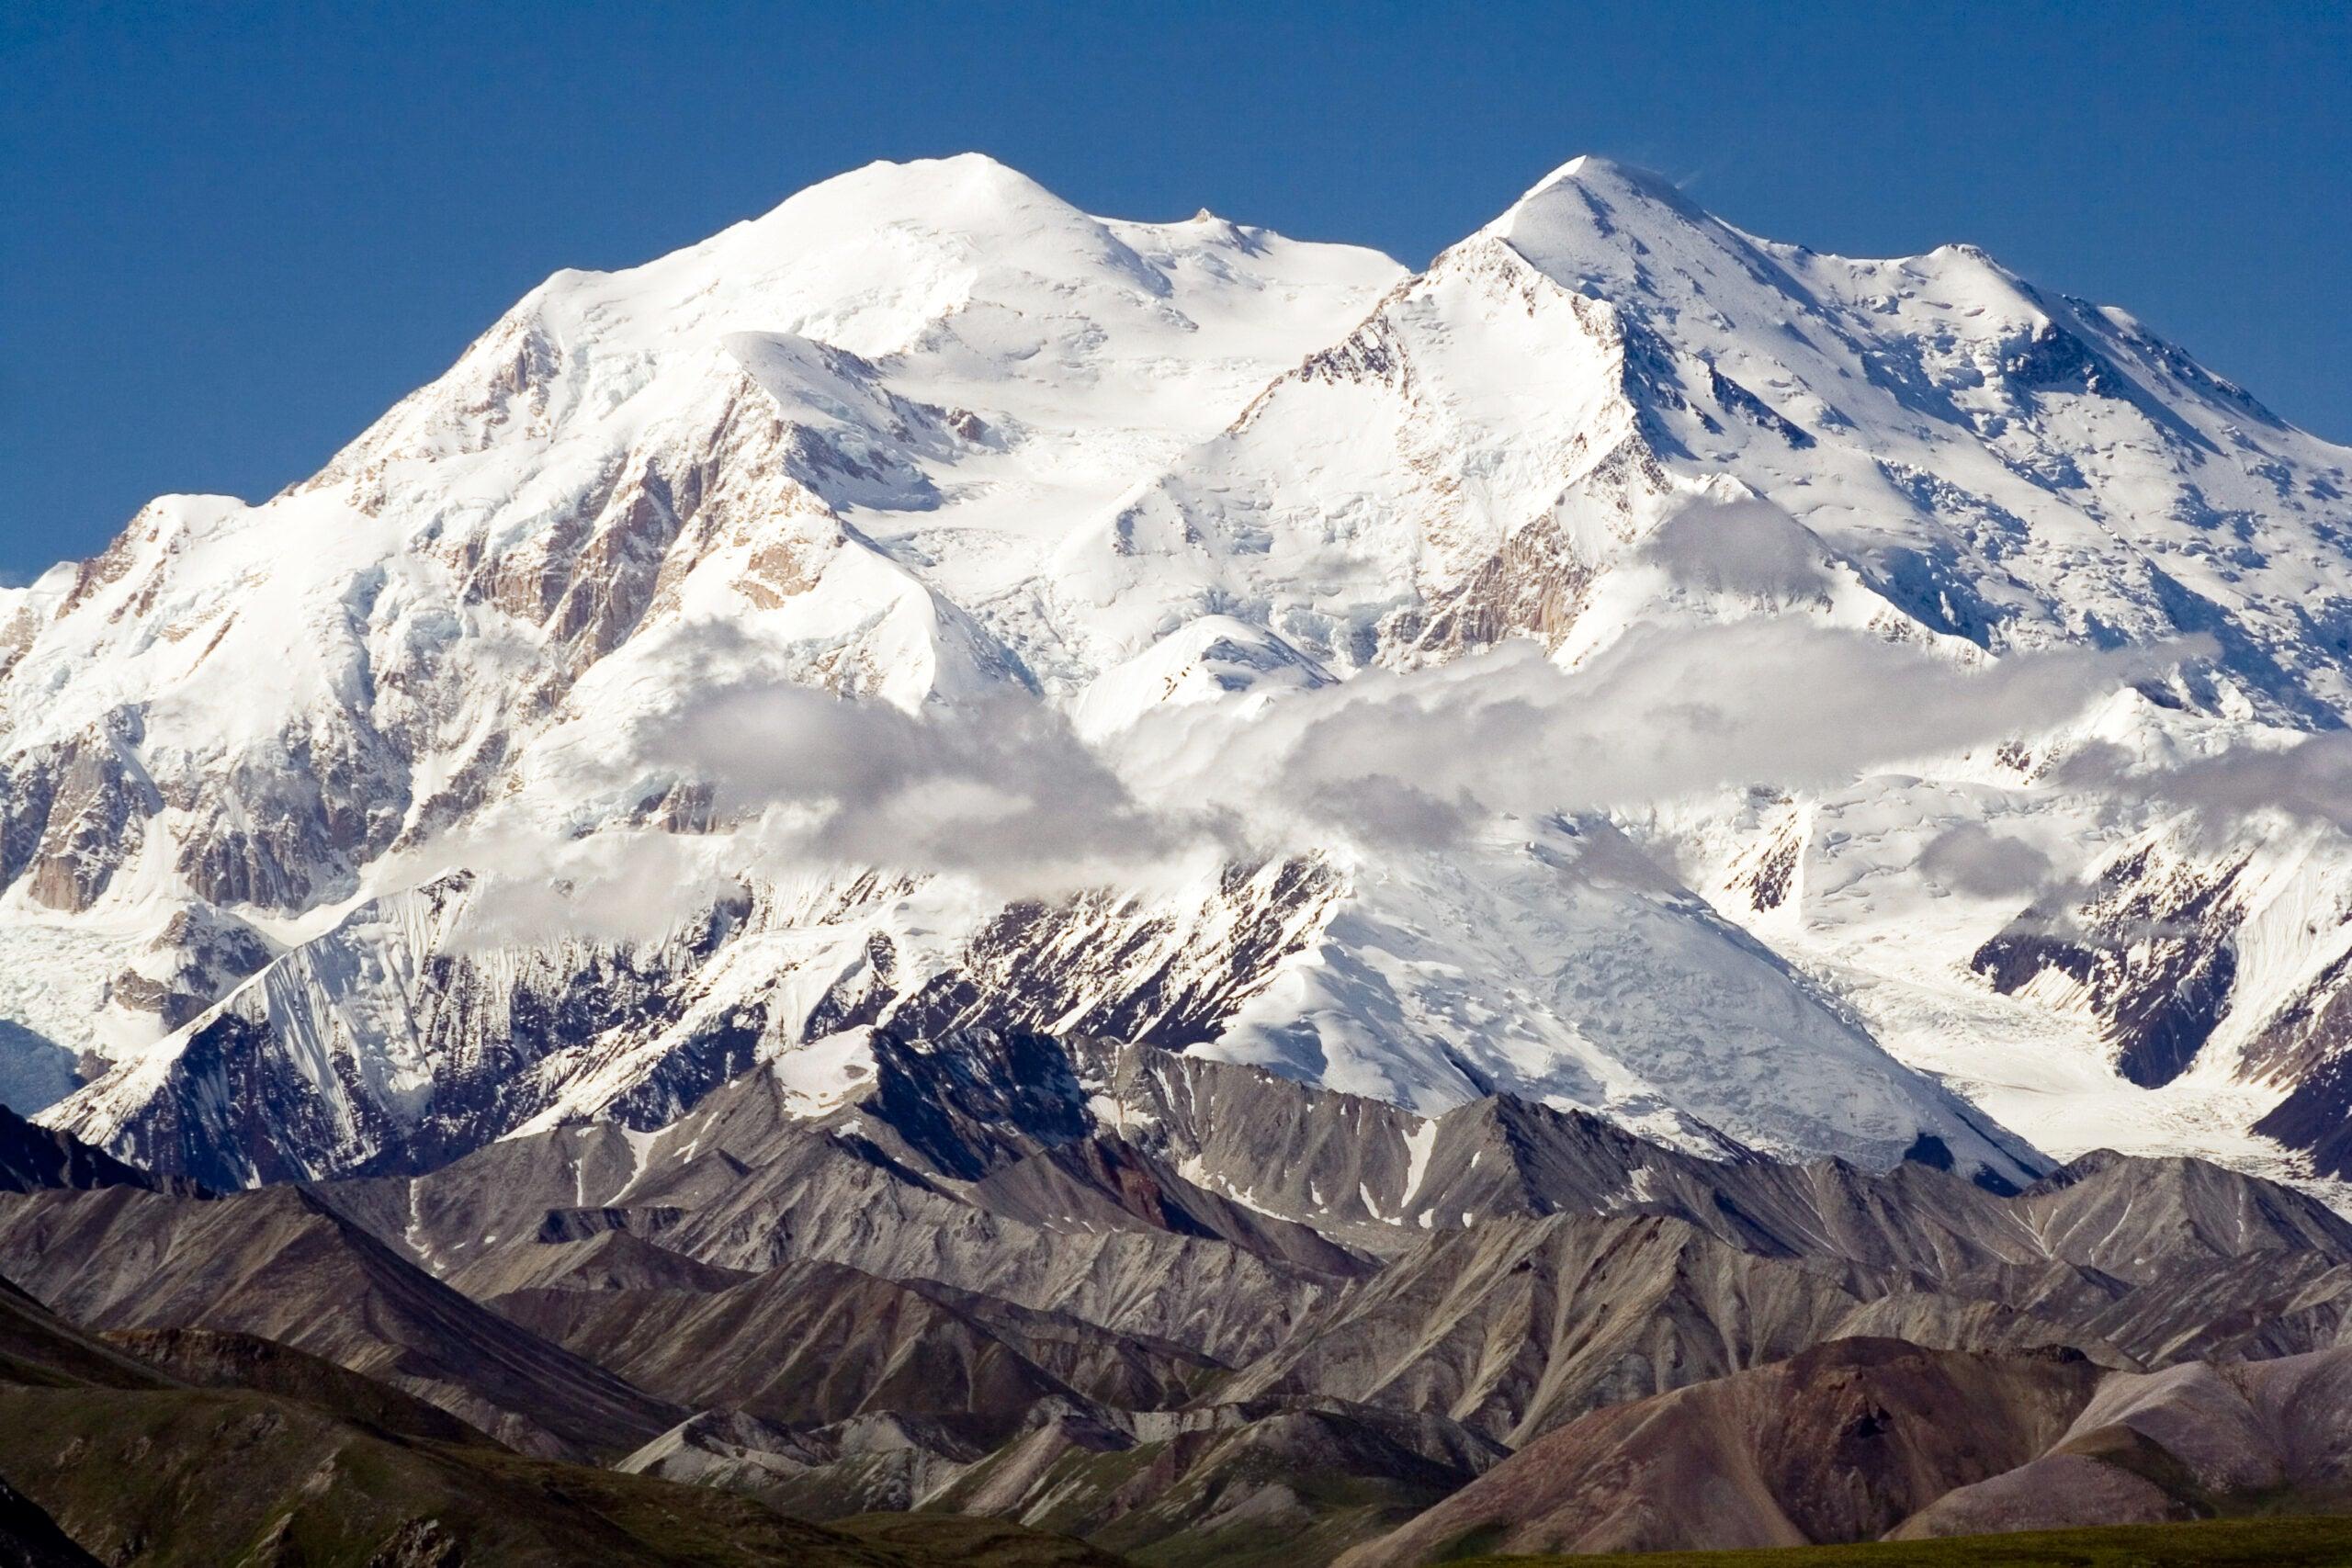 Obama Renames North America's Highest Peak, Denali